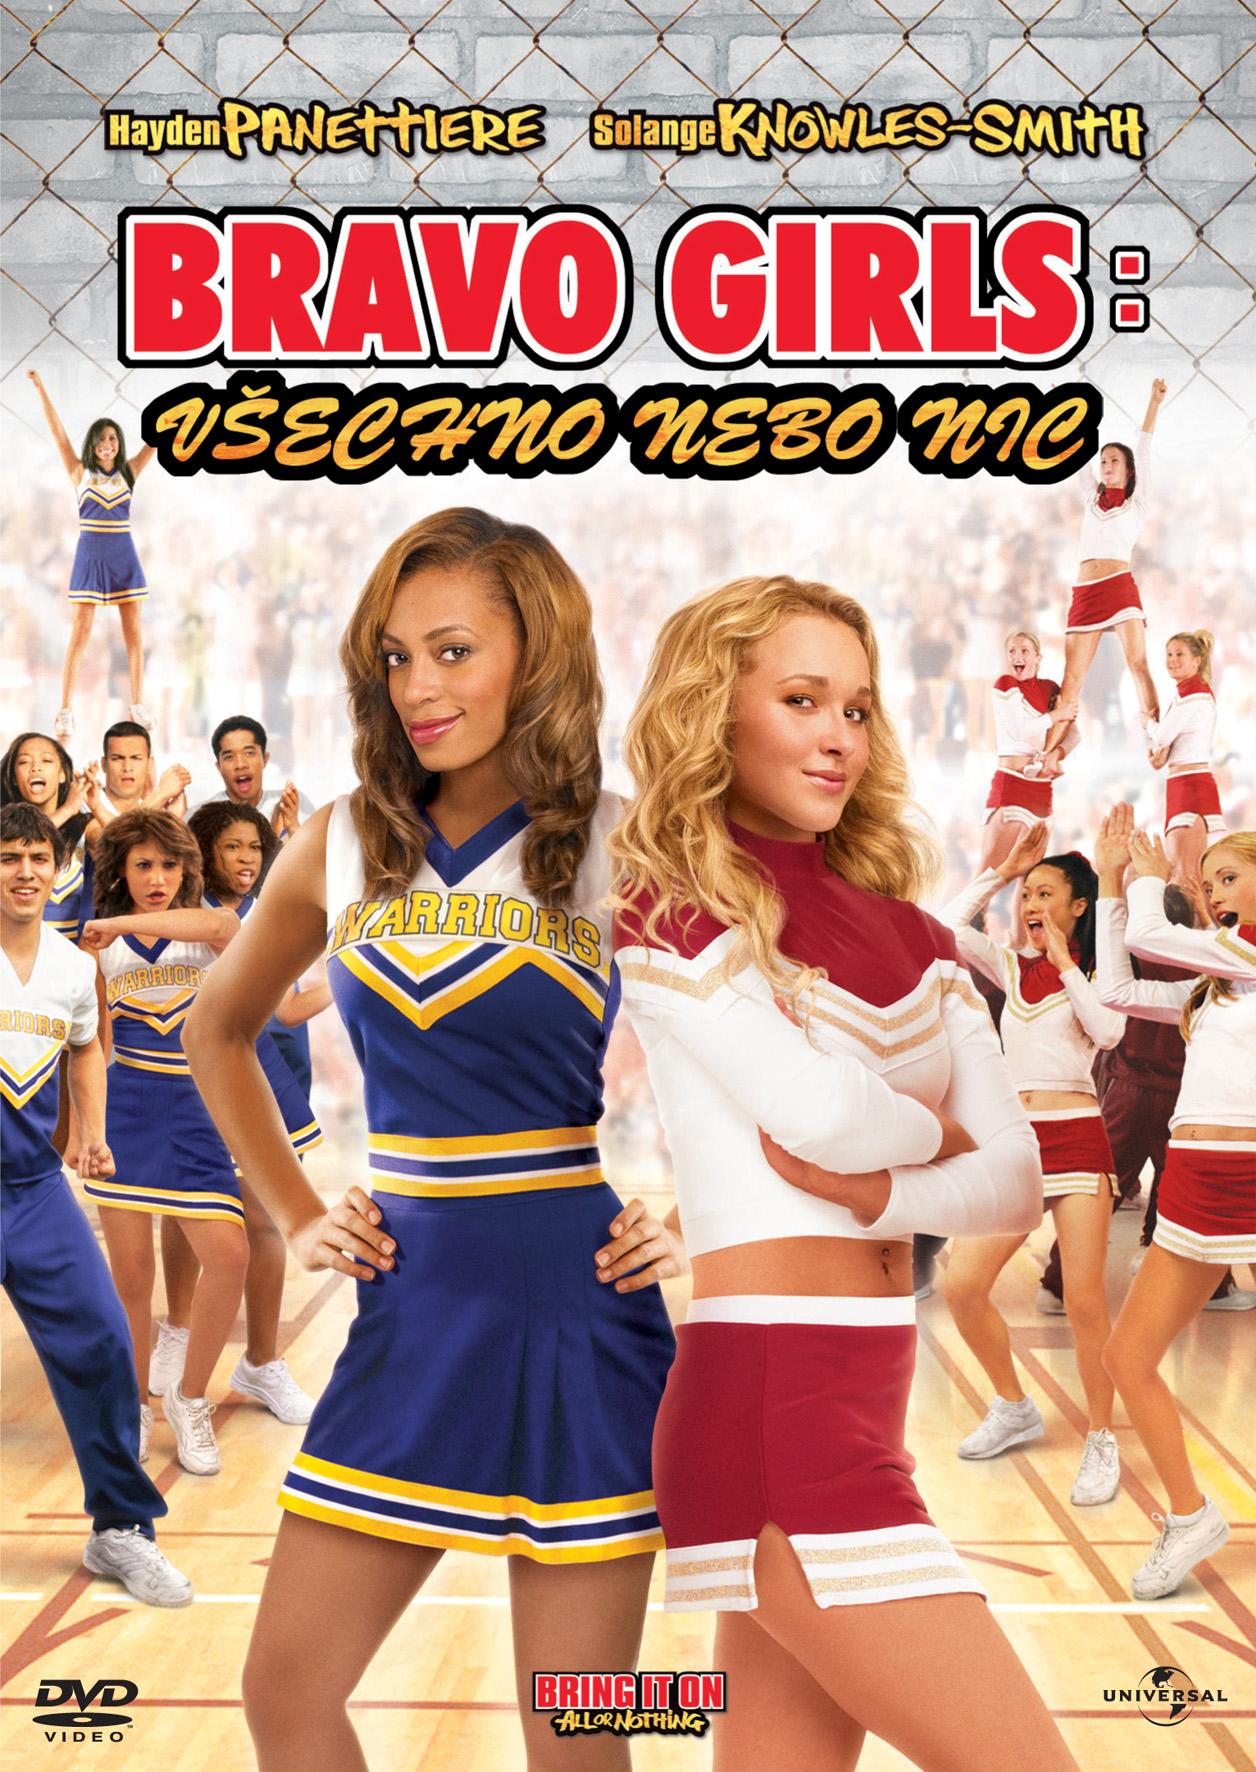 Spustit online film zdarma Bravo Girls: Všechno nebo nic